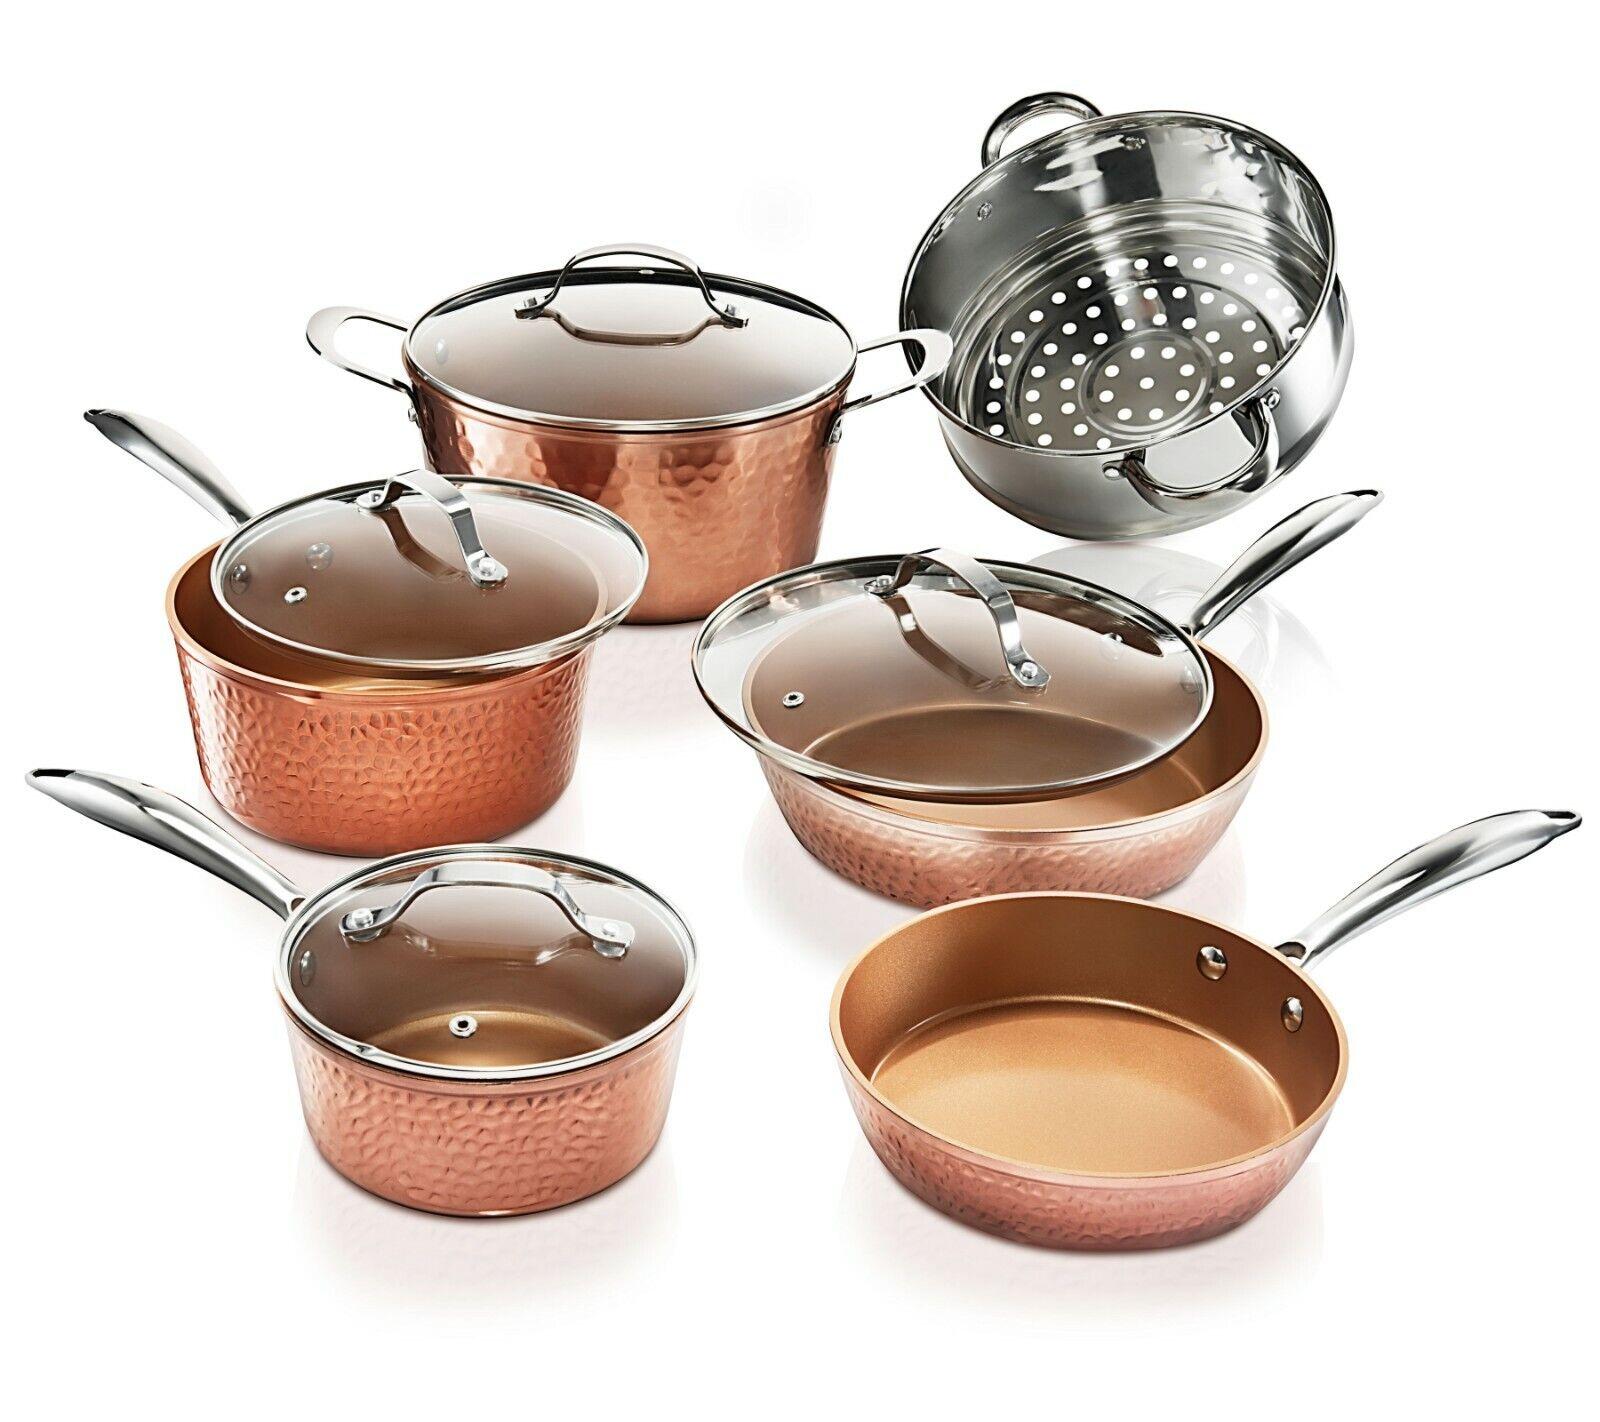 Gotham Steel 10 Piece Hammered Nonstick Copper Cookware Set - AS Seen on TV! NEW